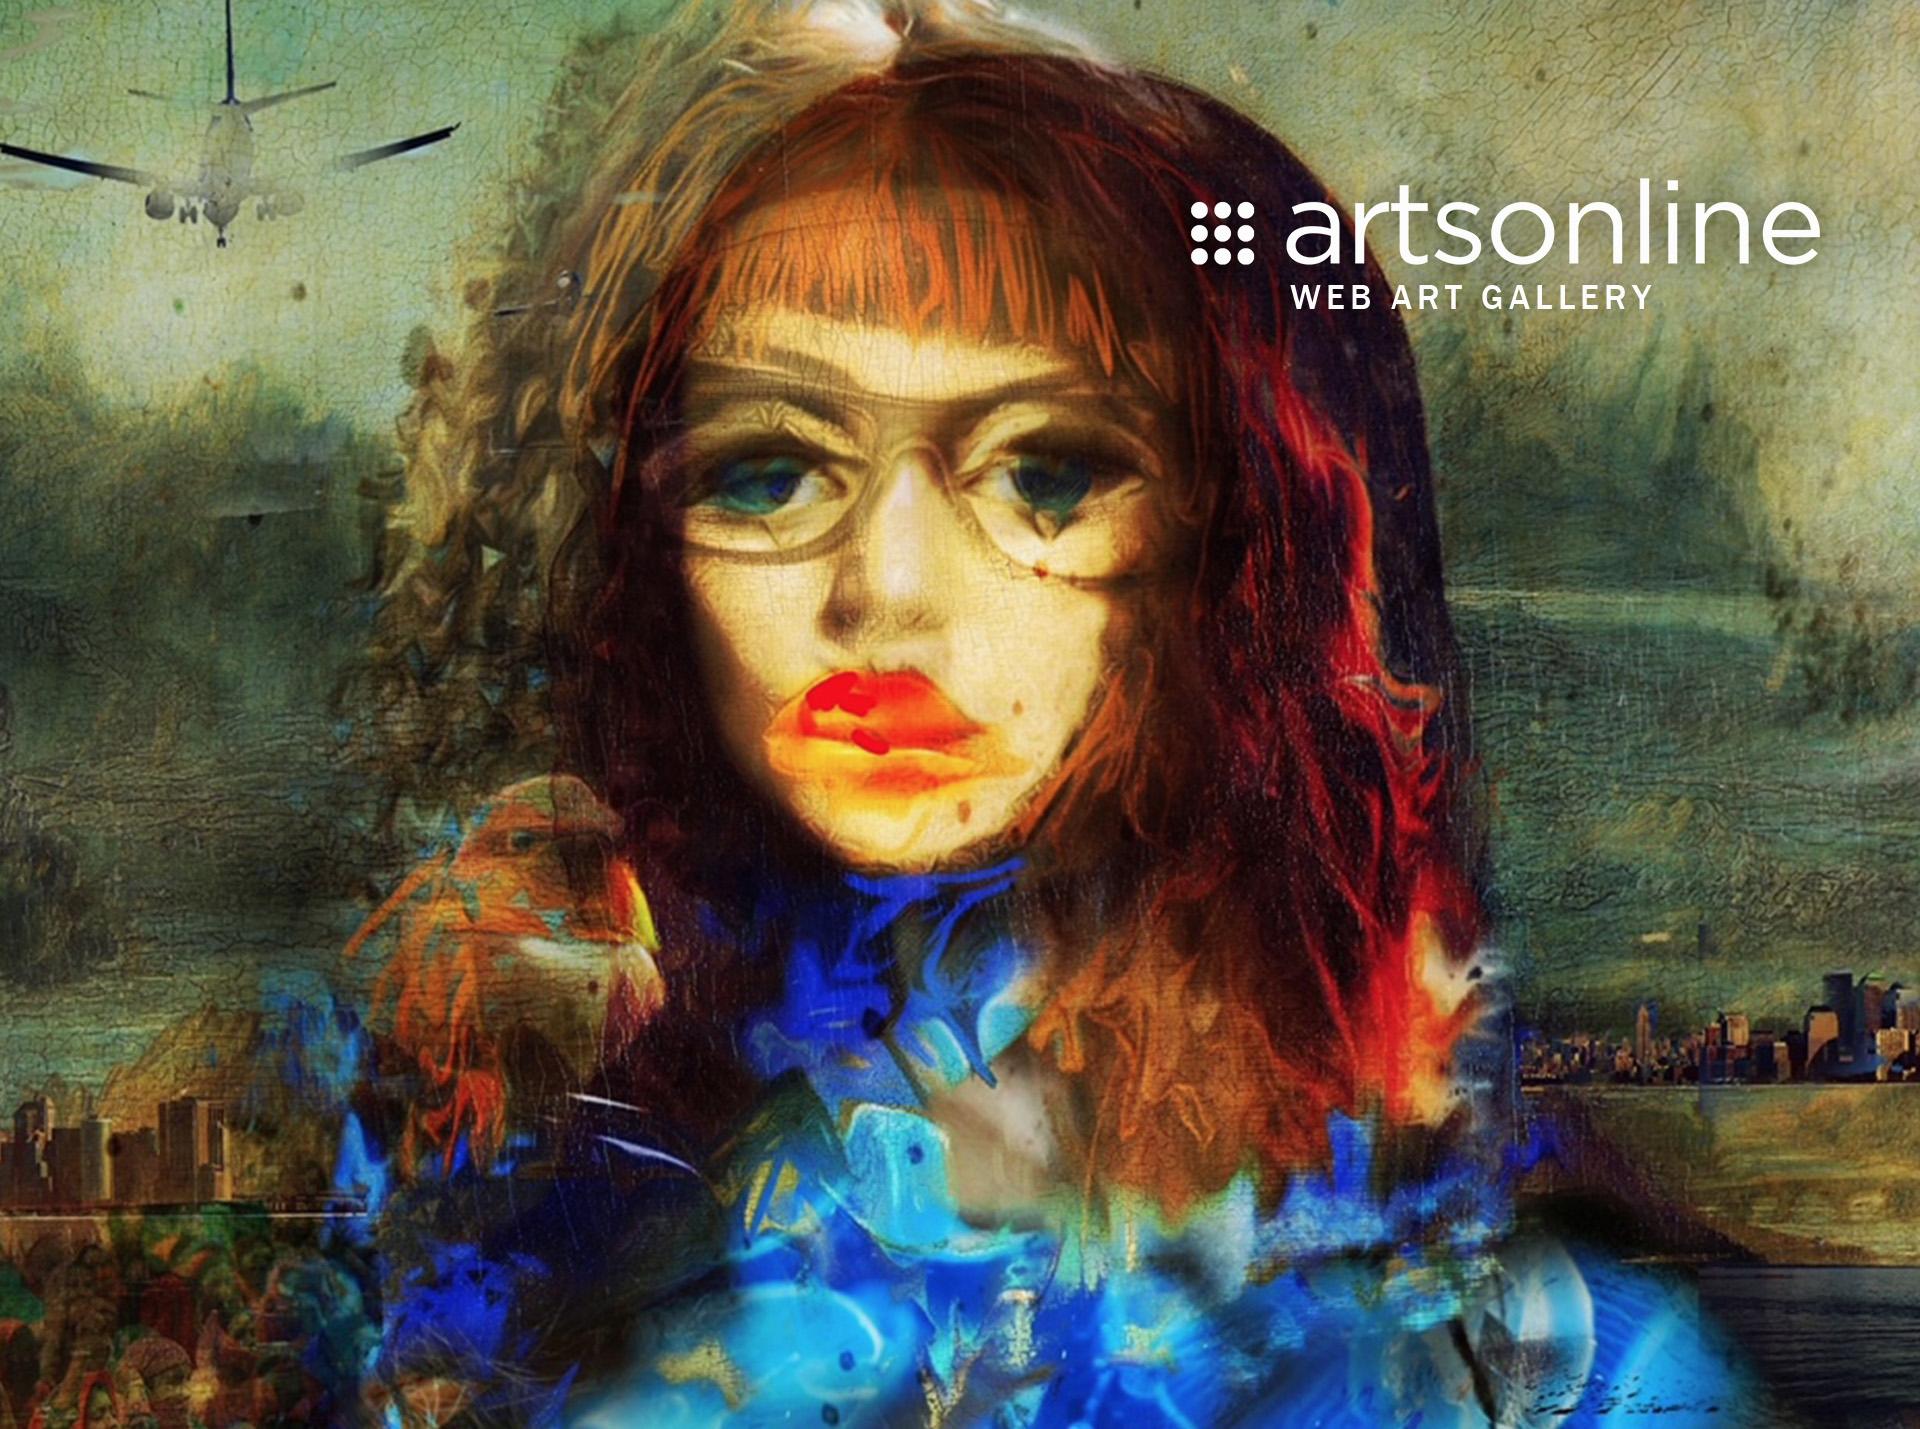 Edibe Taylan Bakış(ma)lar Mobil Sanat Sergisi